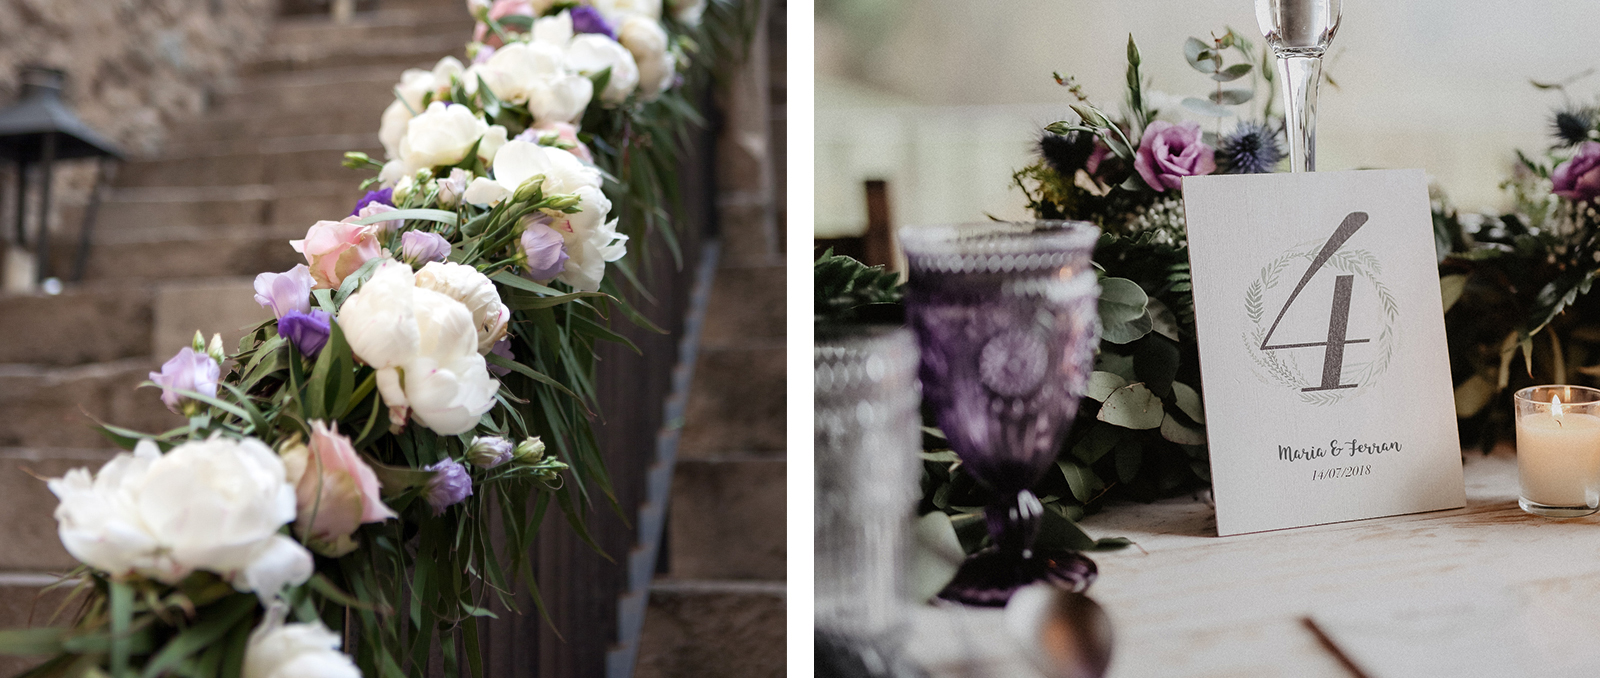 flores-boda-eventos-ramsnroses